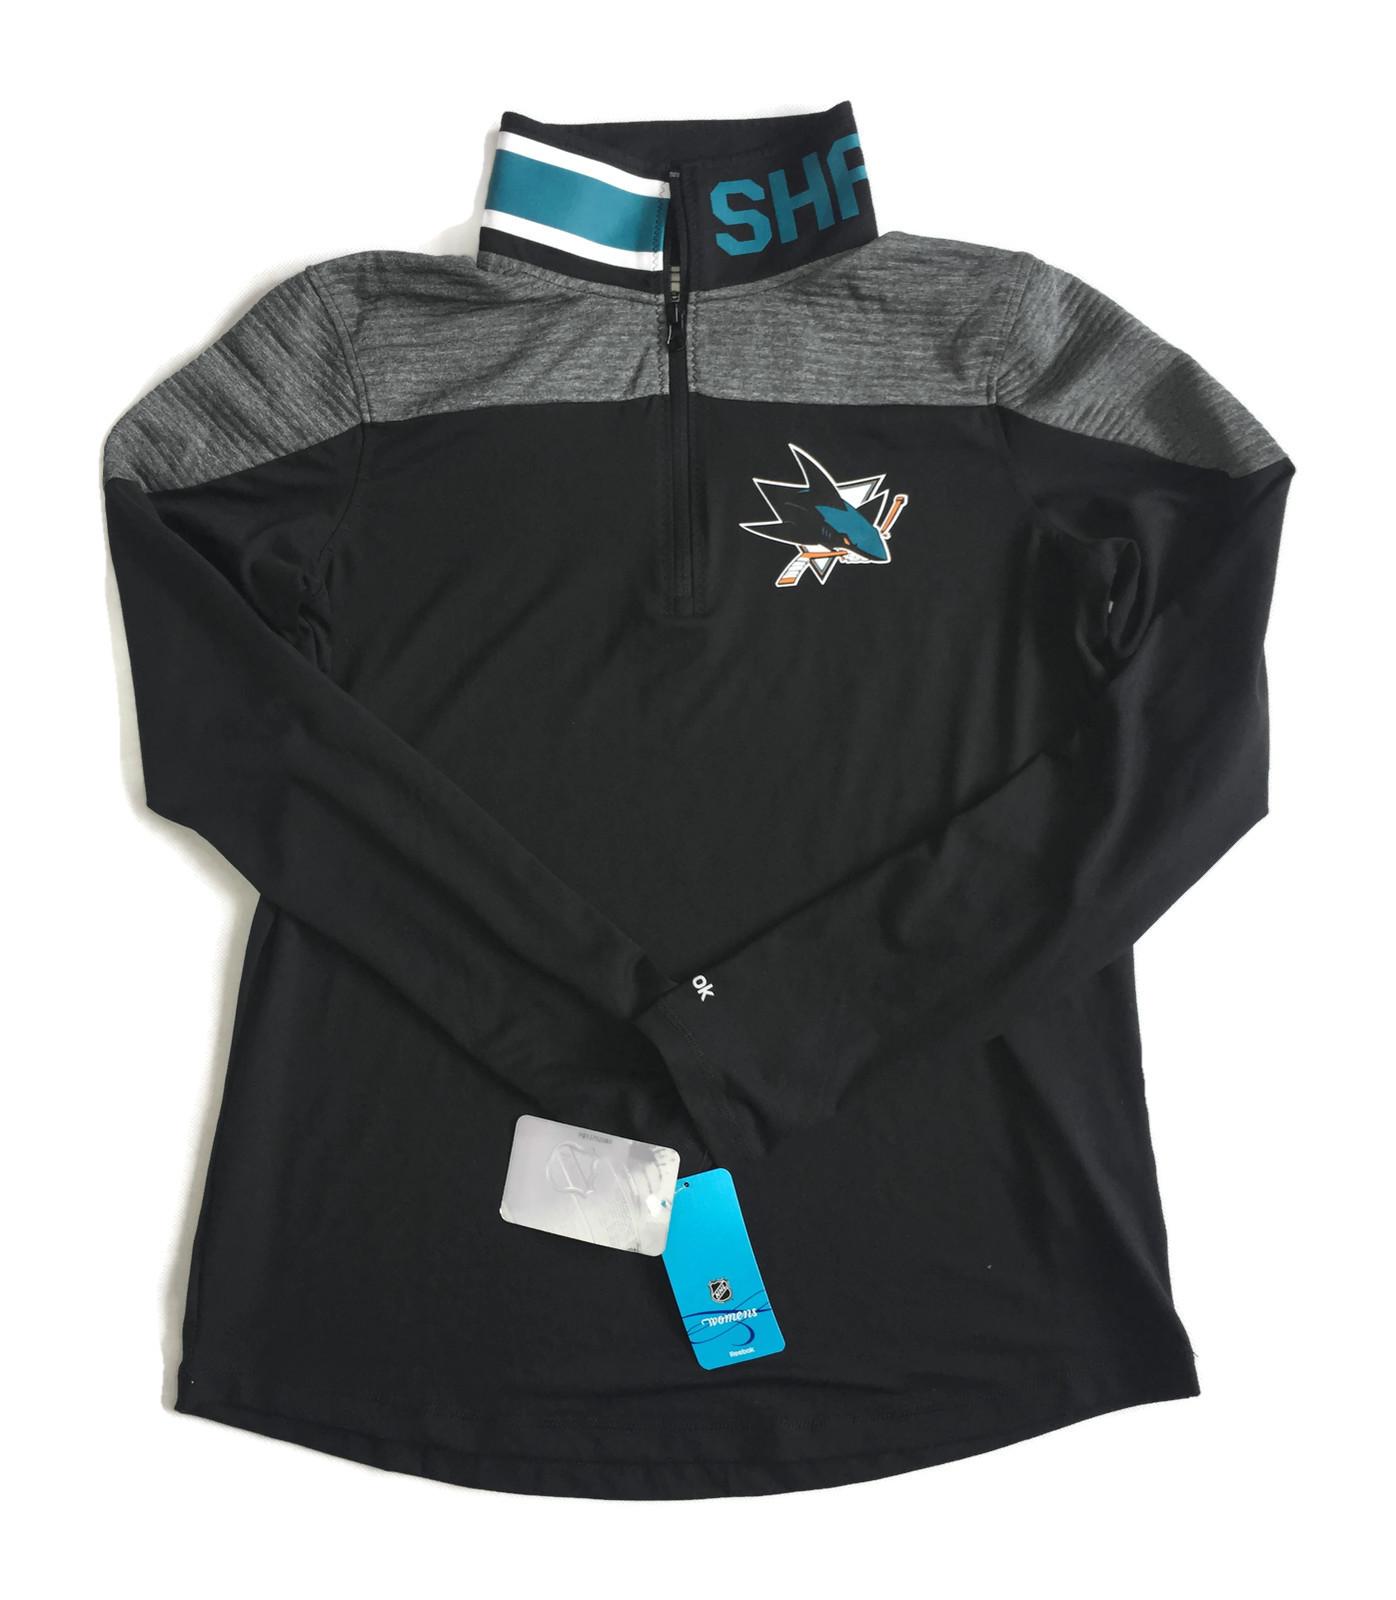 Čierna dámska mikina Reebok NHL San Jose Sharks XL